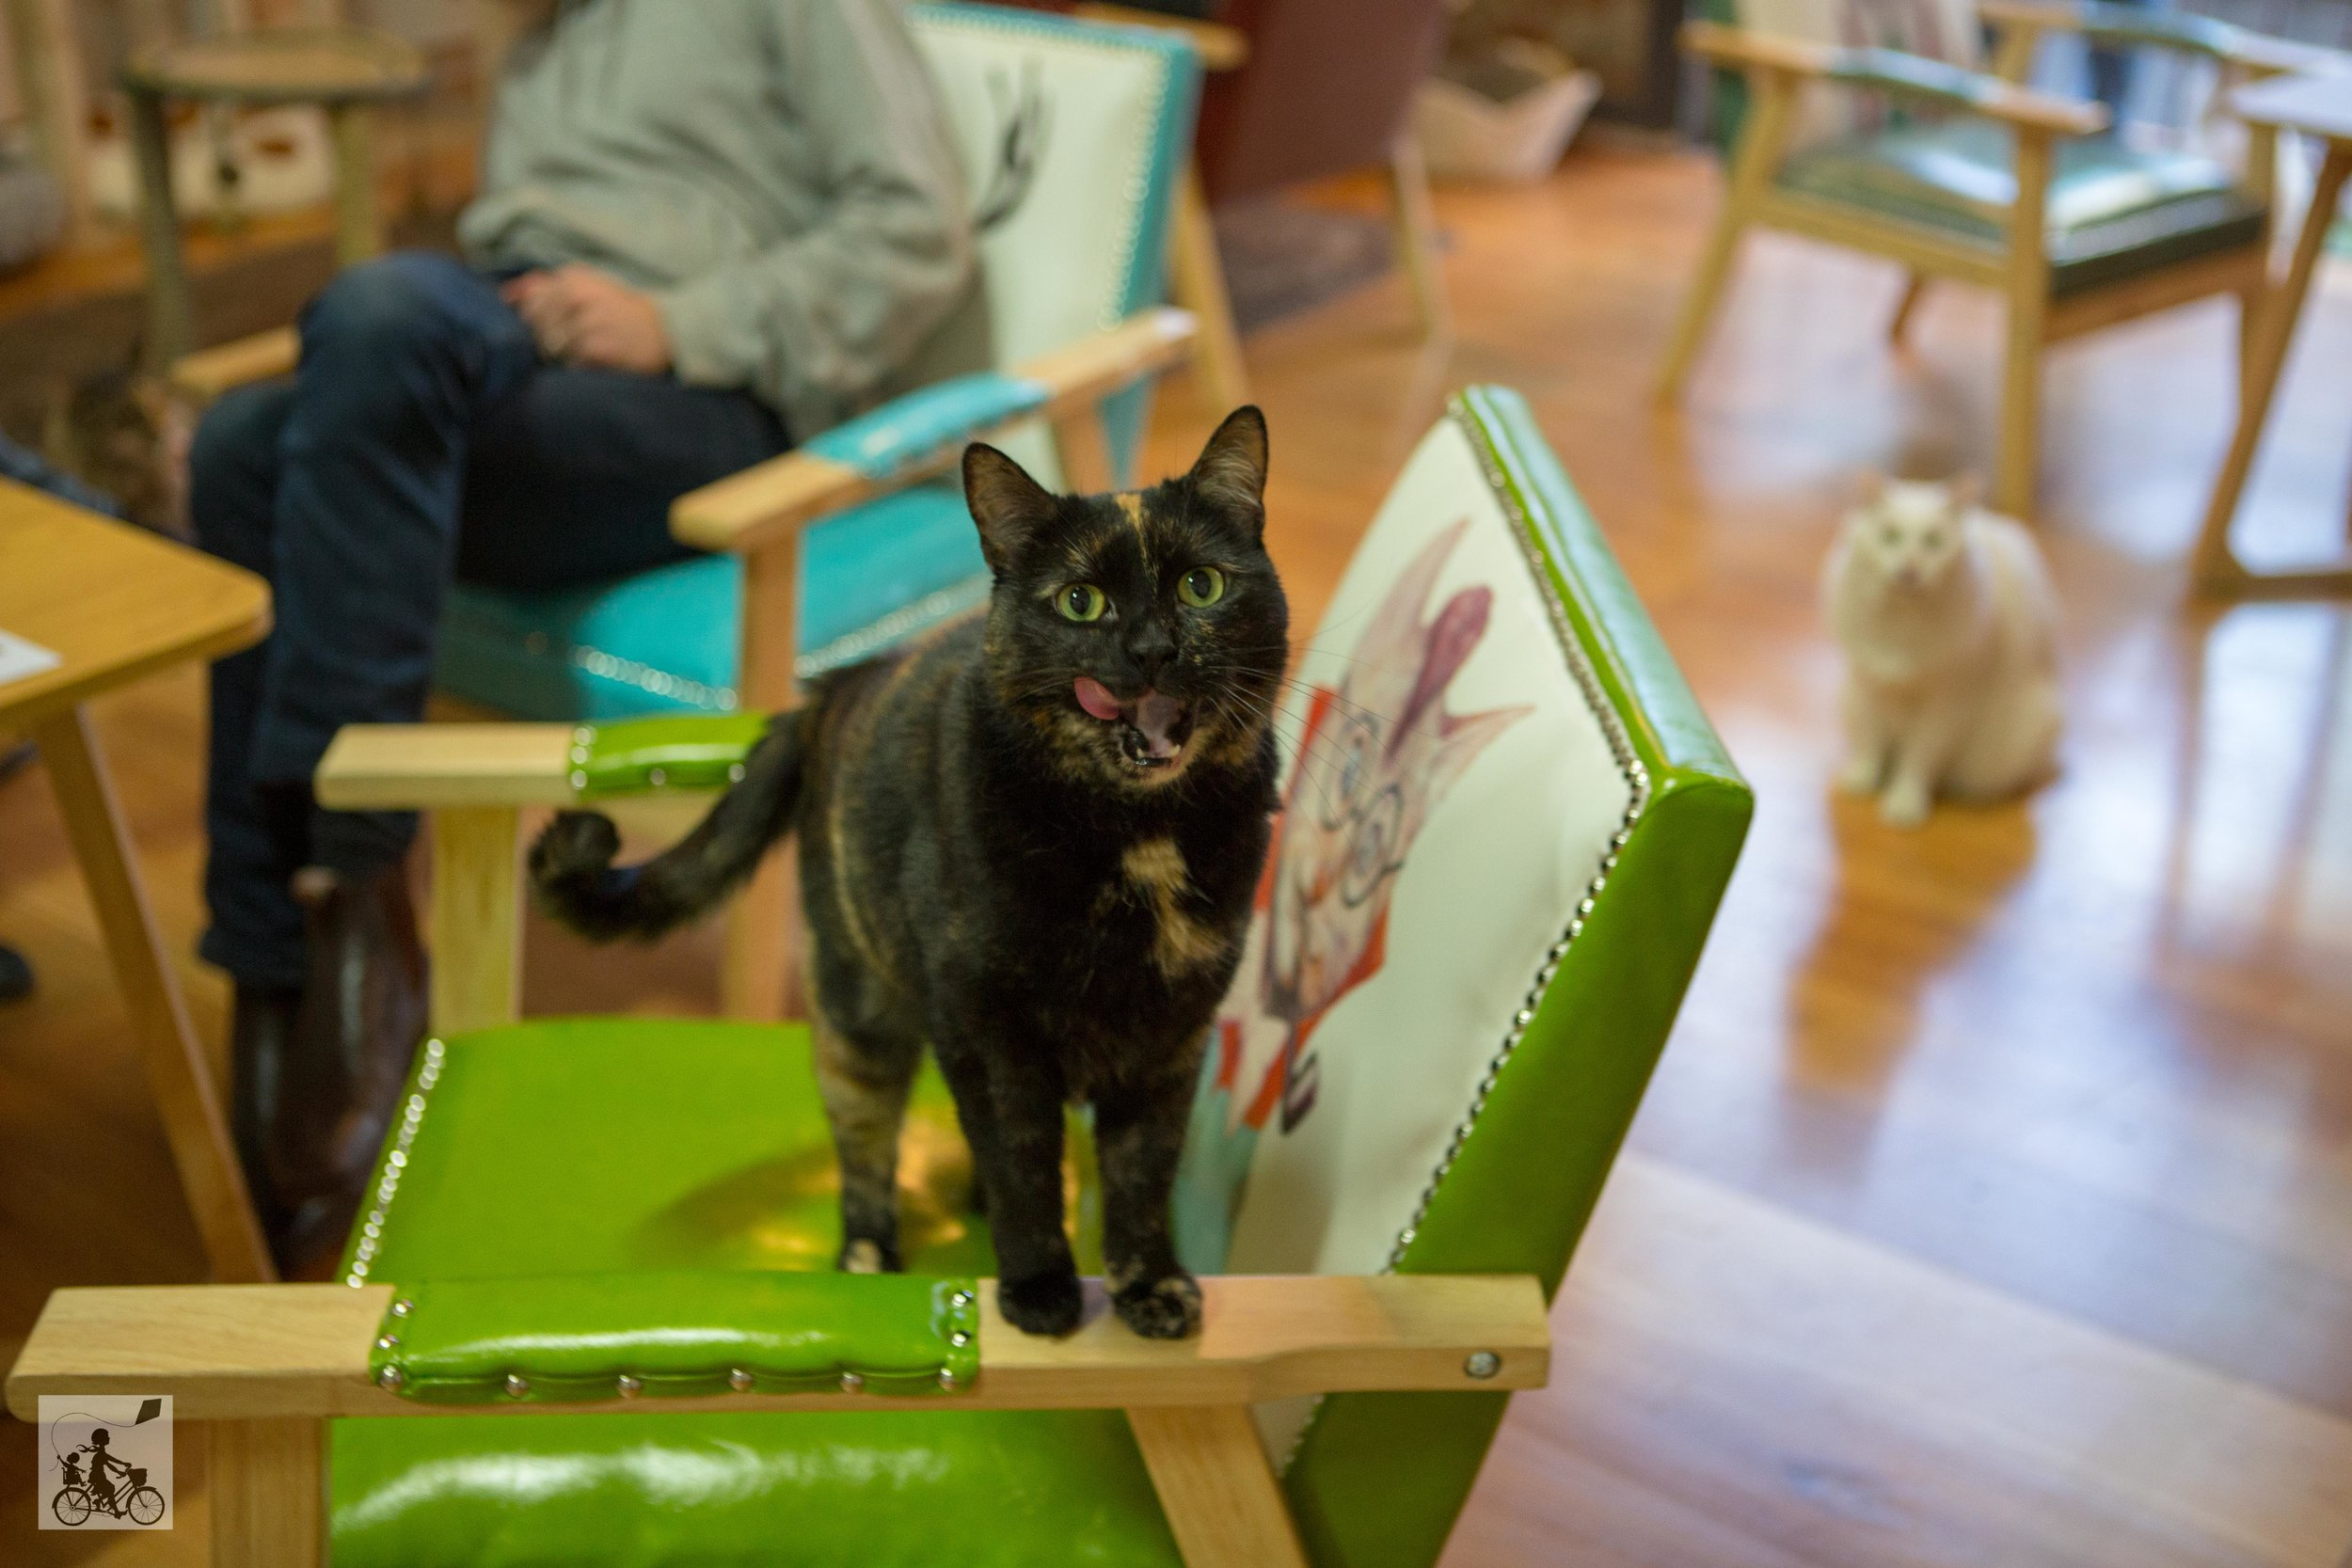 cat cafe, melbourne - mamma knows melbourne